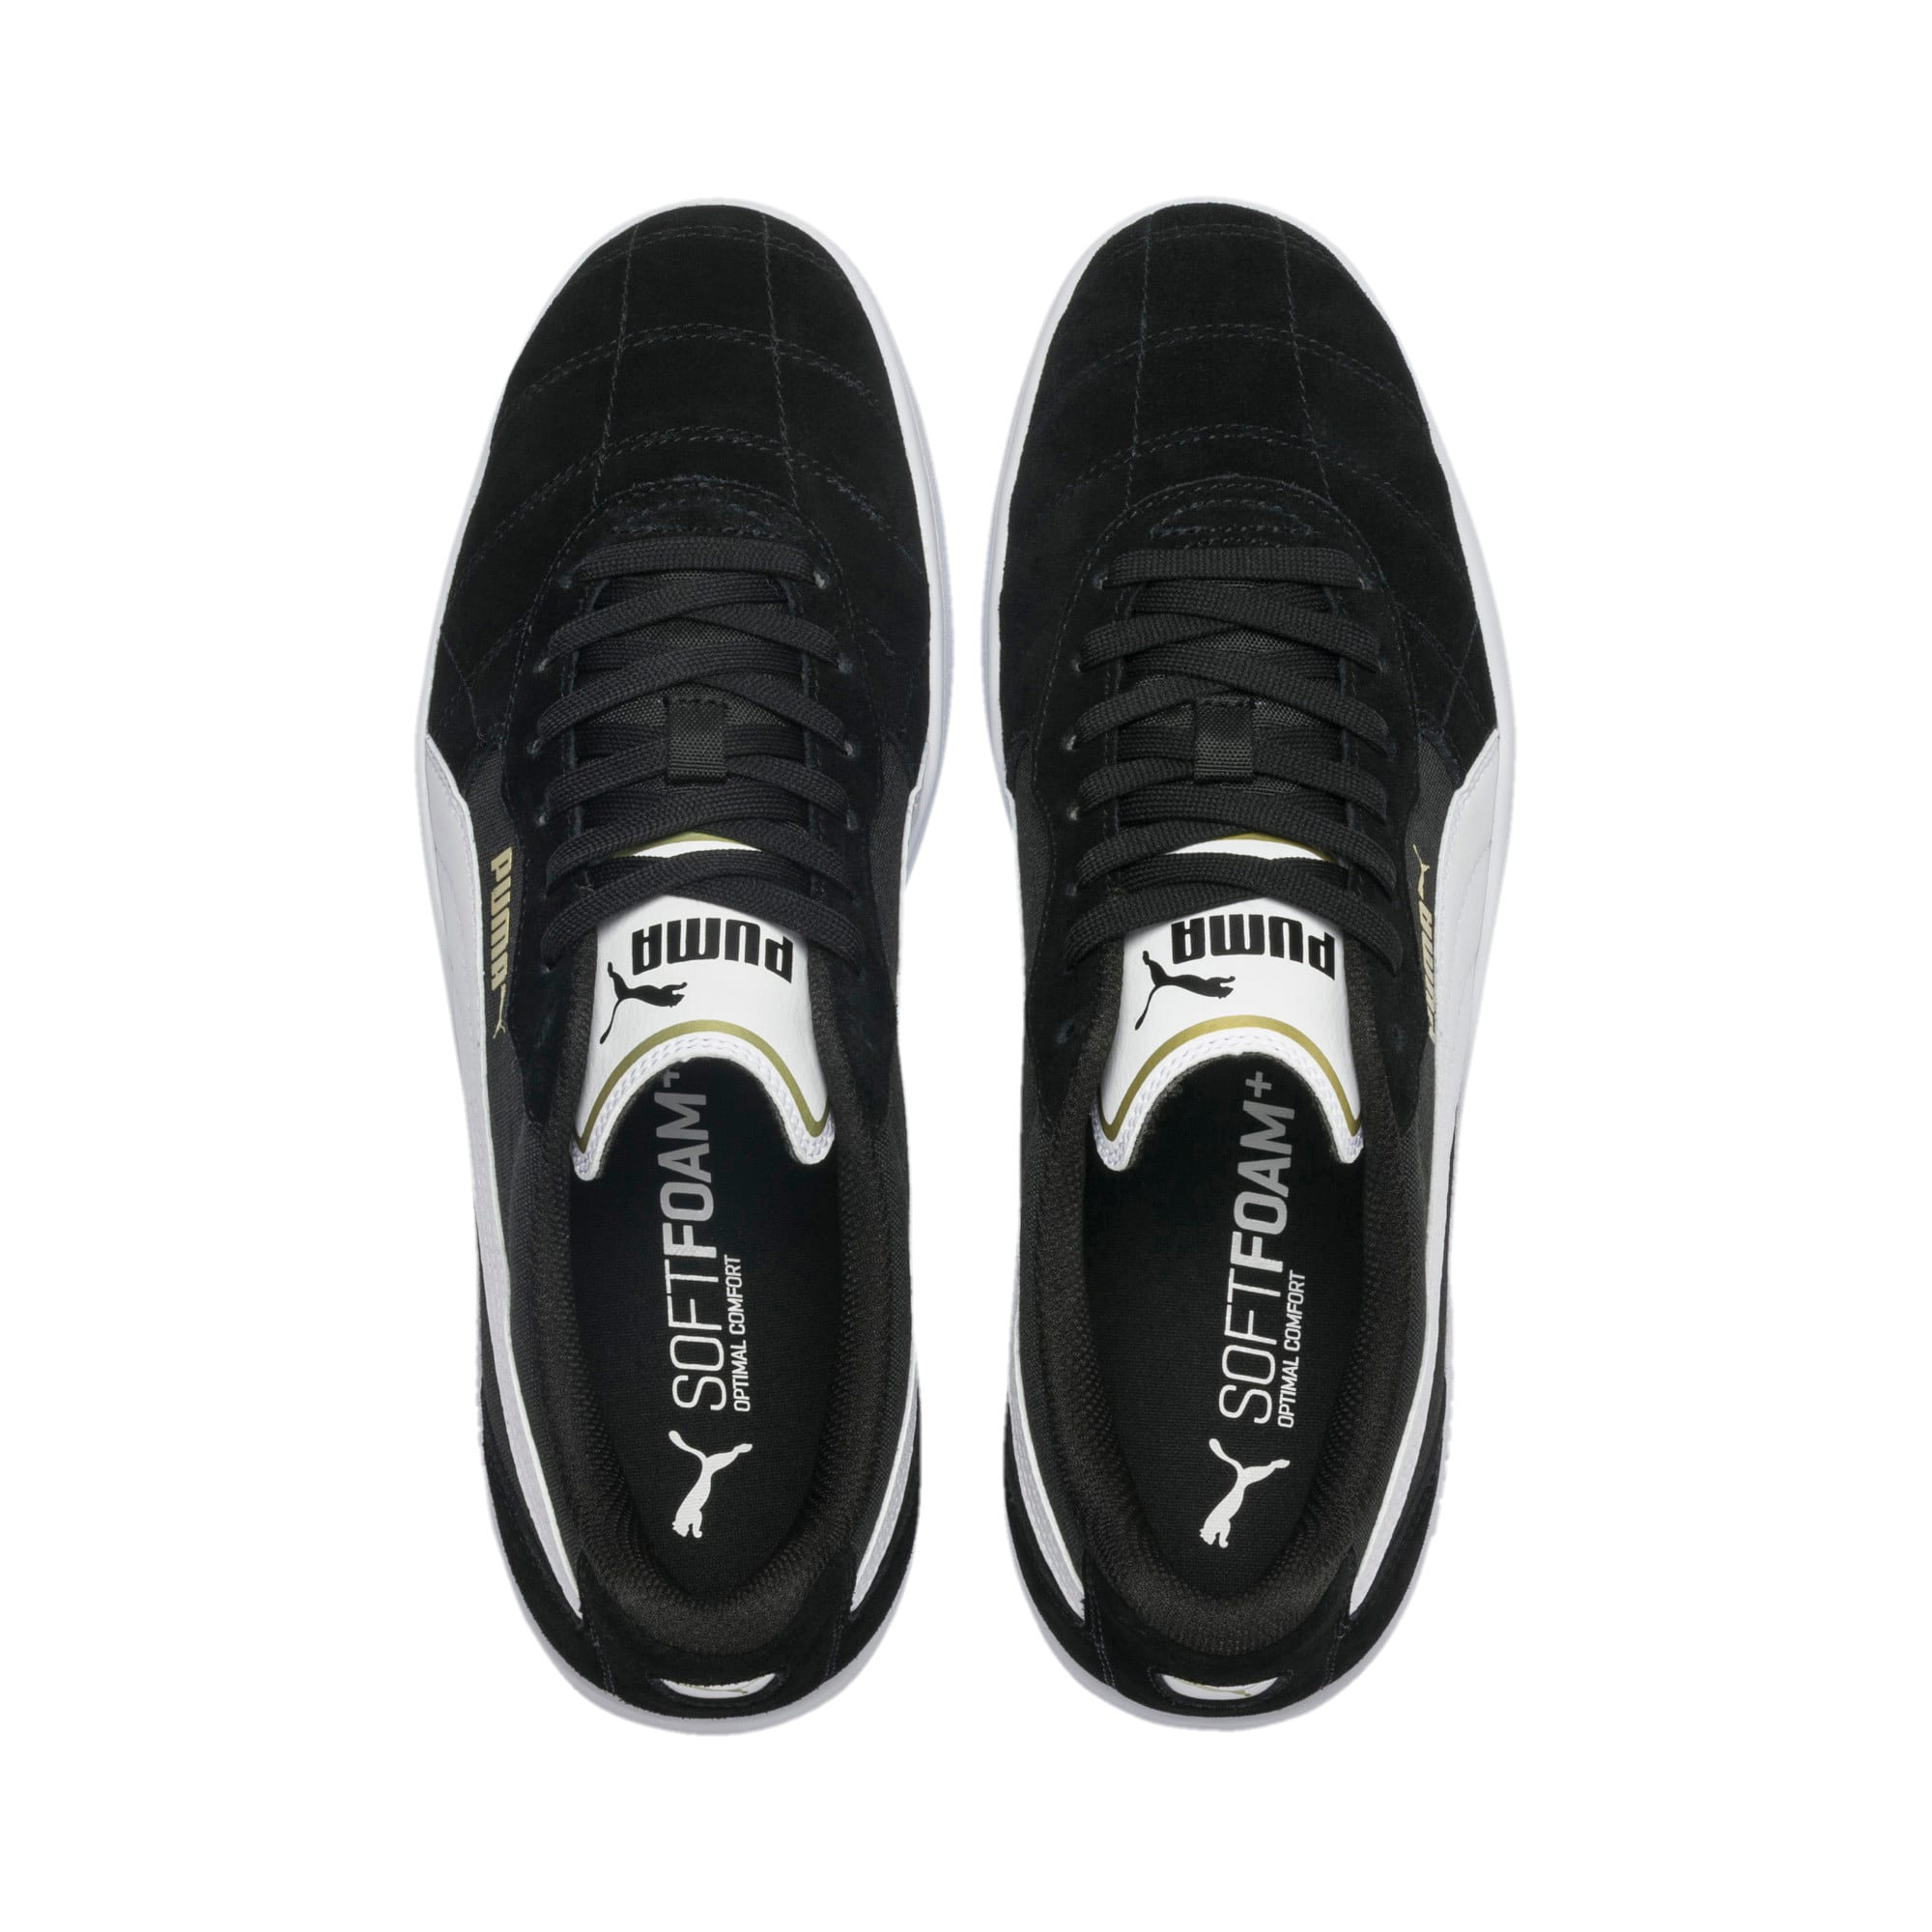 Thumbnail 7 of Astro Kick Sneakers, Puma Black-Puma White, medium